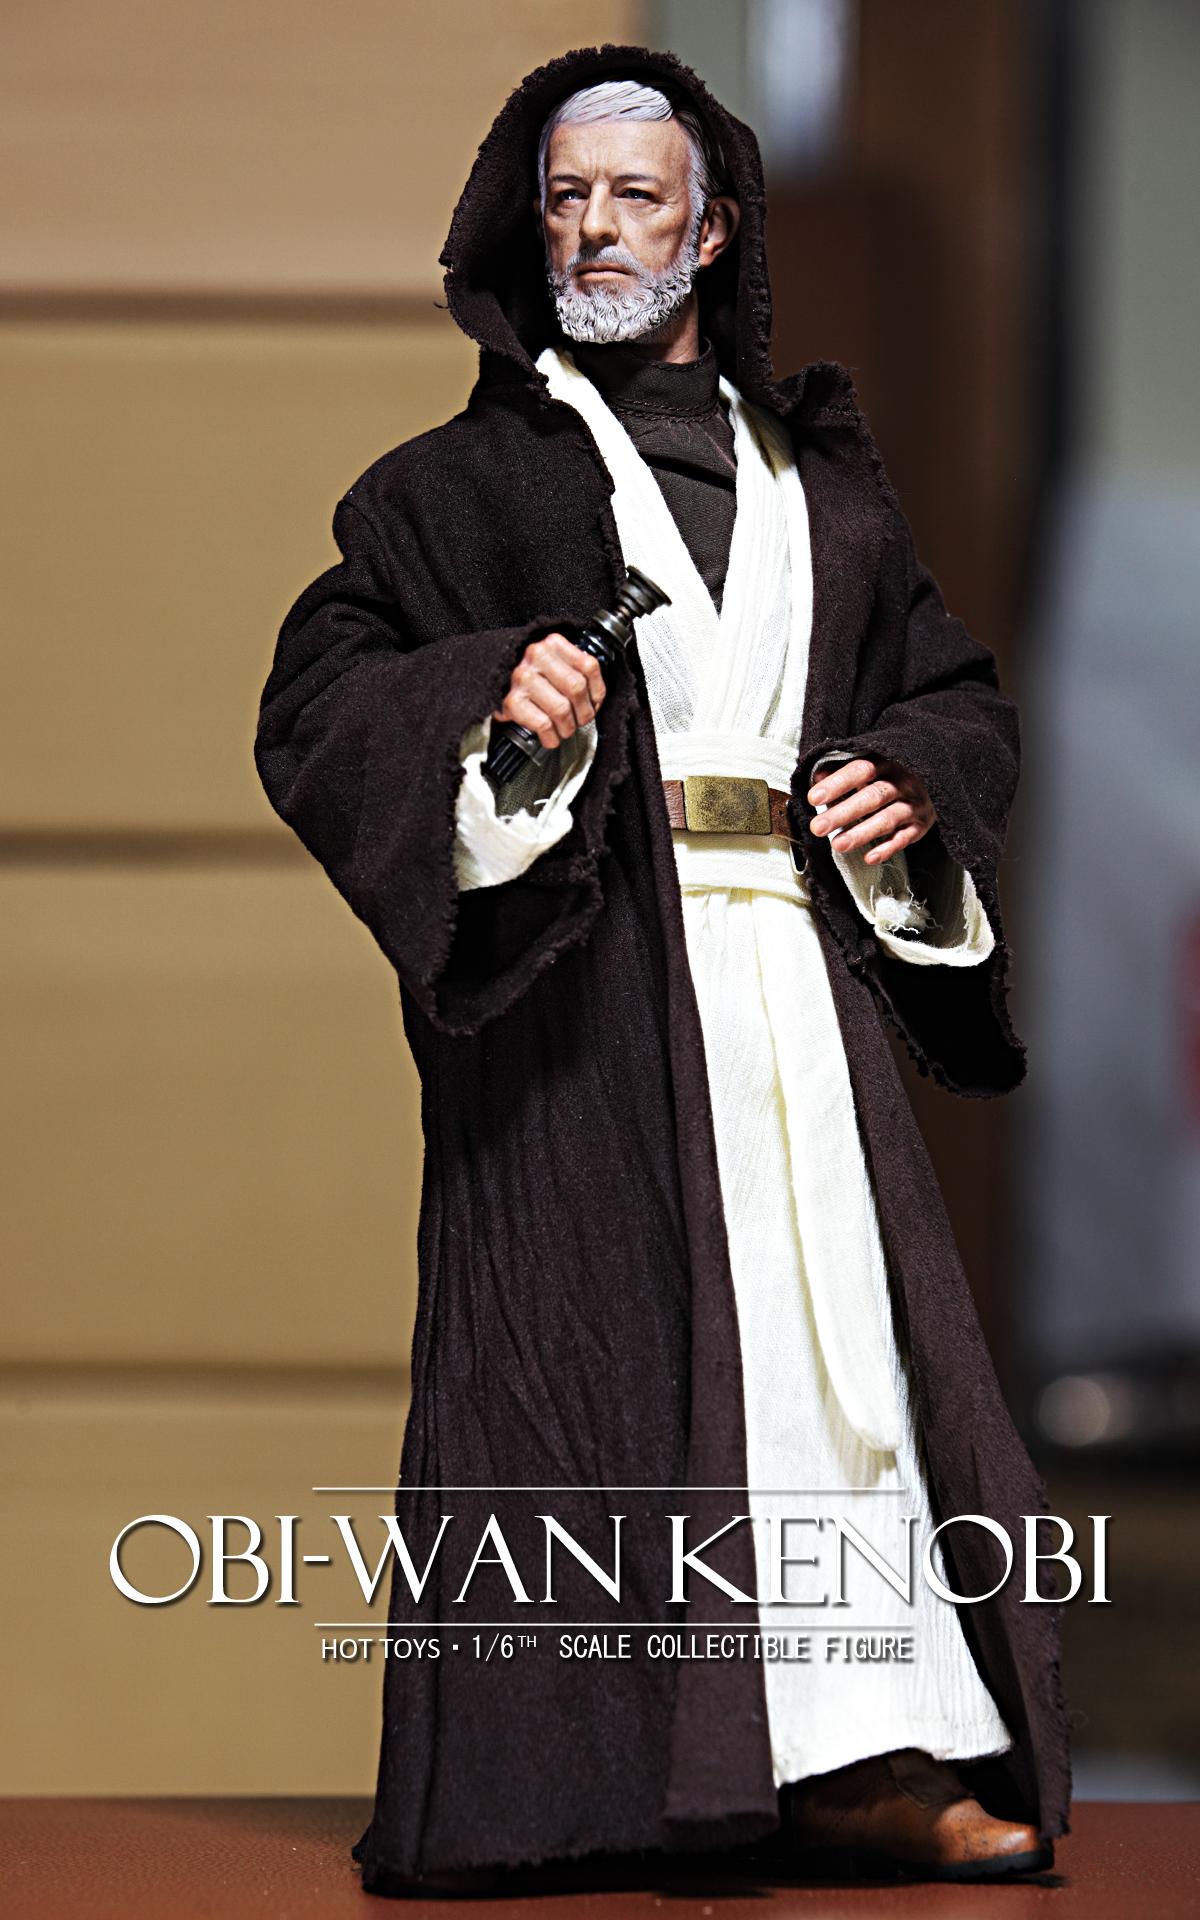 hottoys-star-wars-episode-IV-a-new-hope-obi-wan-kenobi-picture02